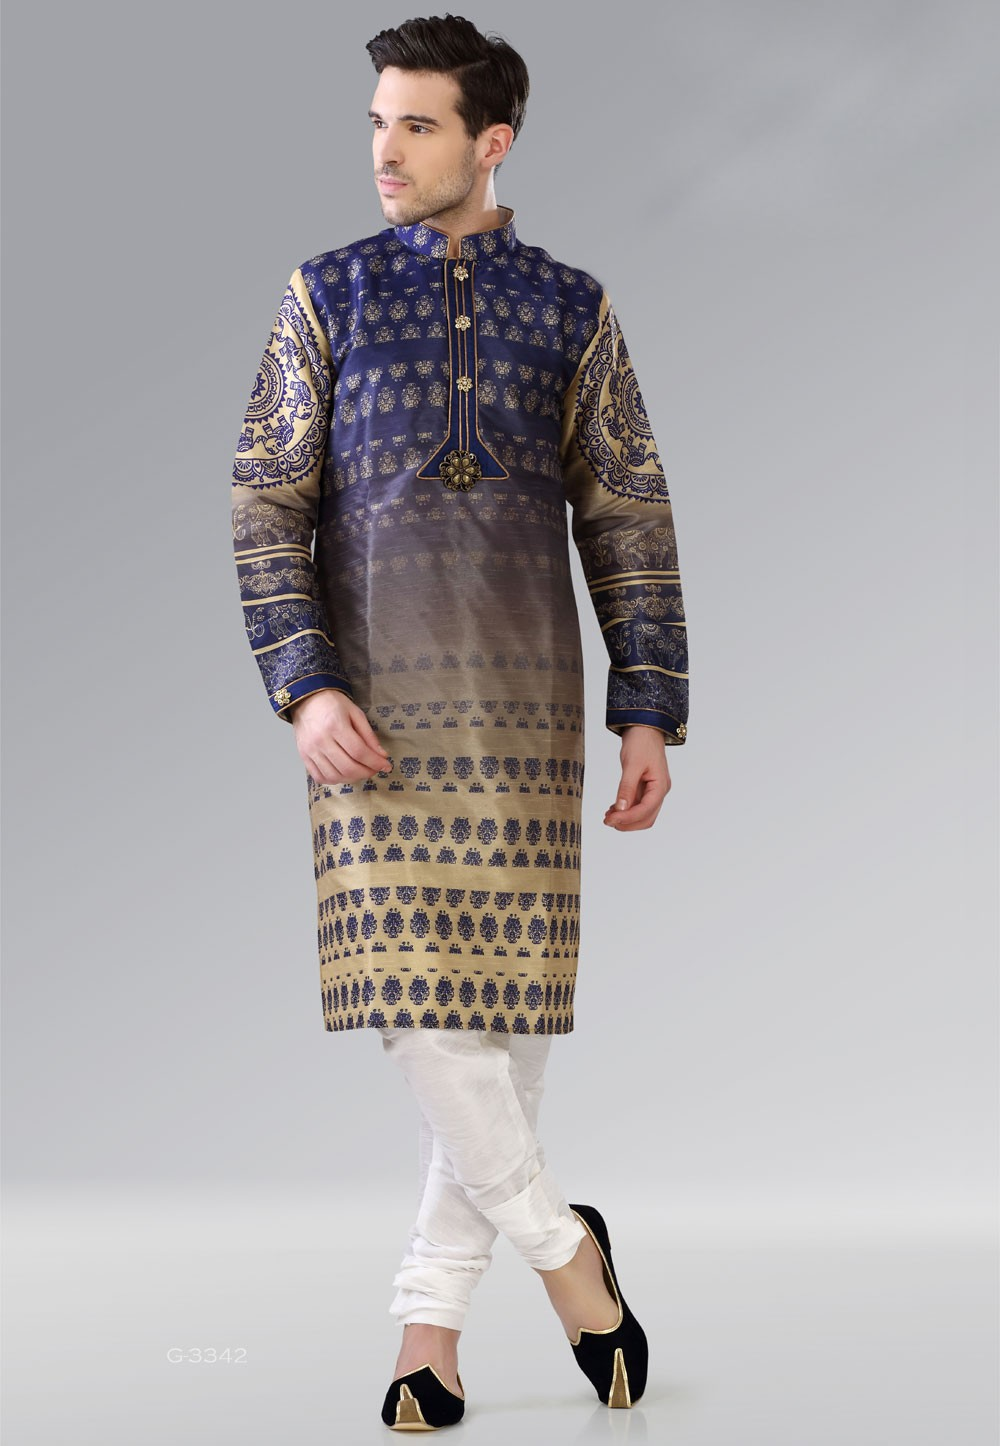 Men's Exquisite Dupion Silk & Beige,Blue Color Readymade Kurta Pajama.